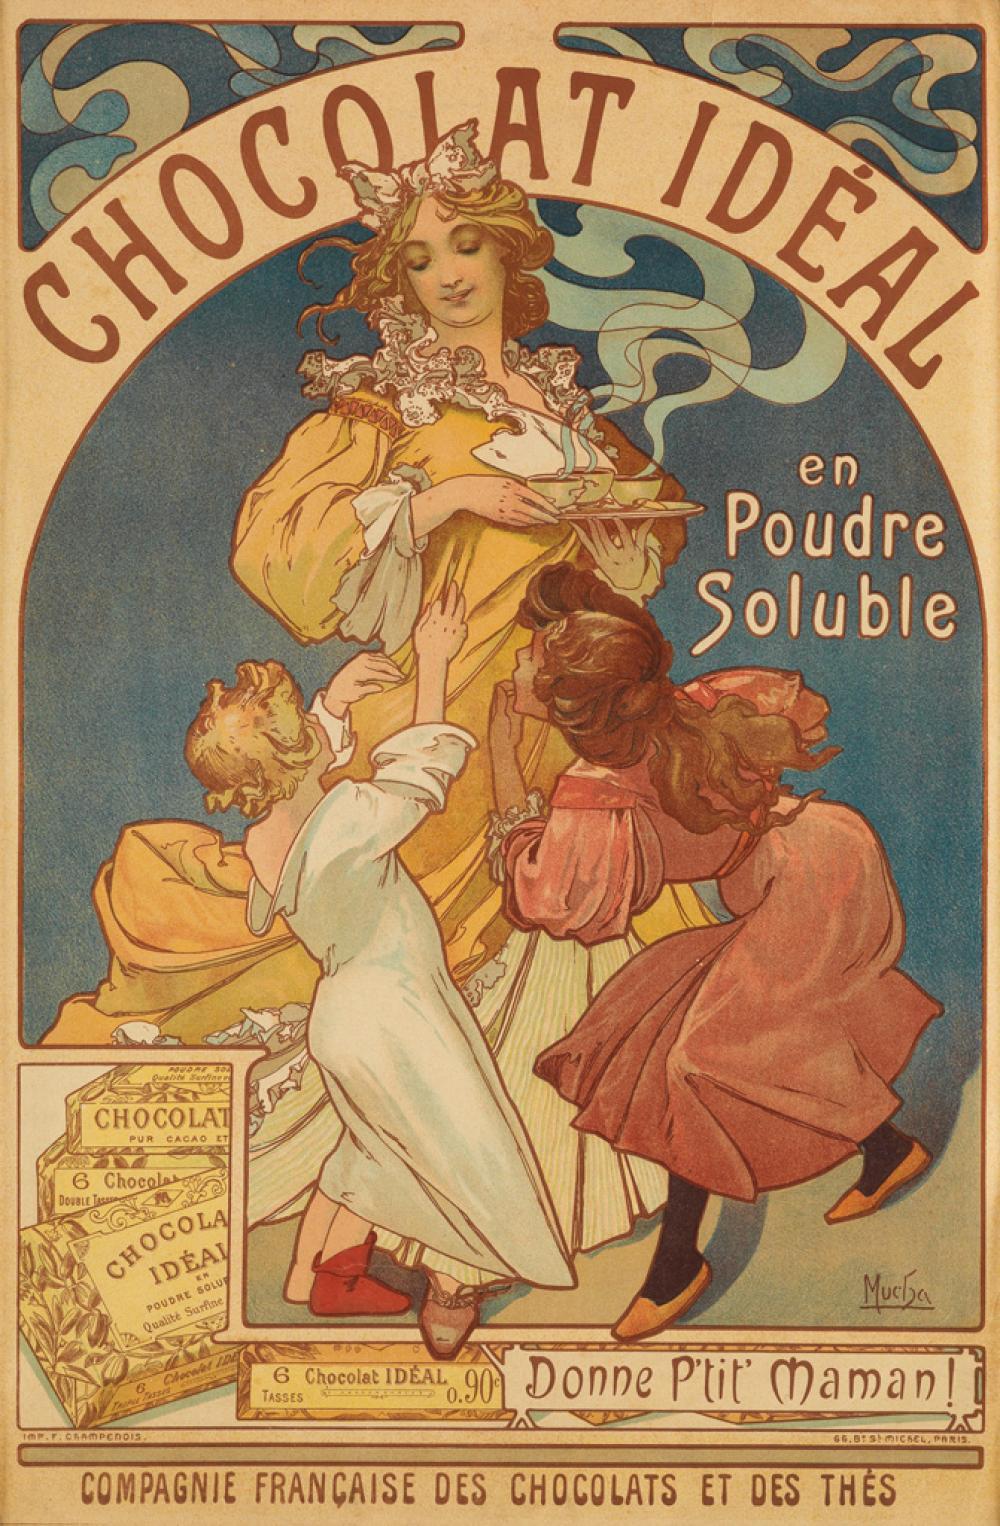 ALPHONSE MUCHA (1860-1939). CHOCOLAT IDÉAL. 1897. 21x13 inches, 53x35 cm. F. Champenois, Paris.